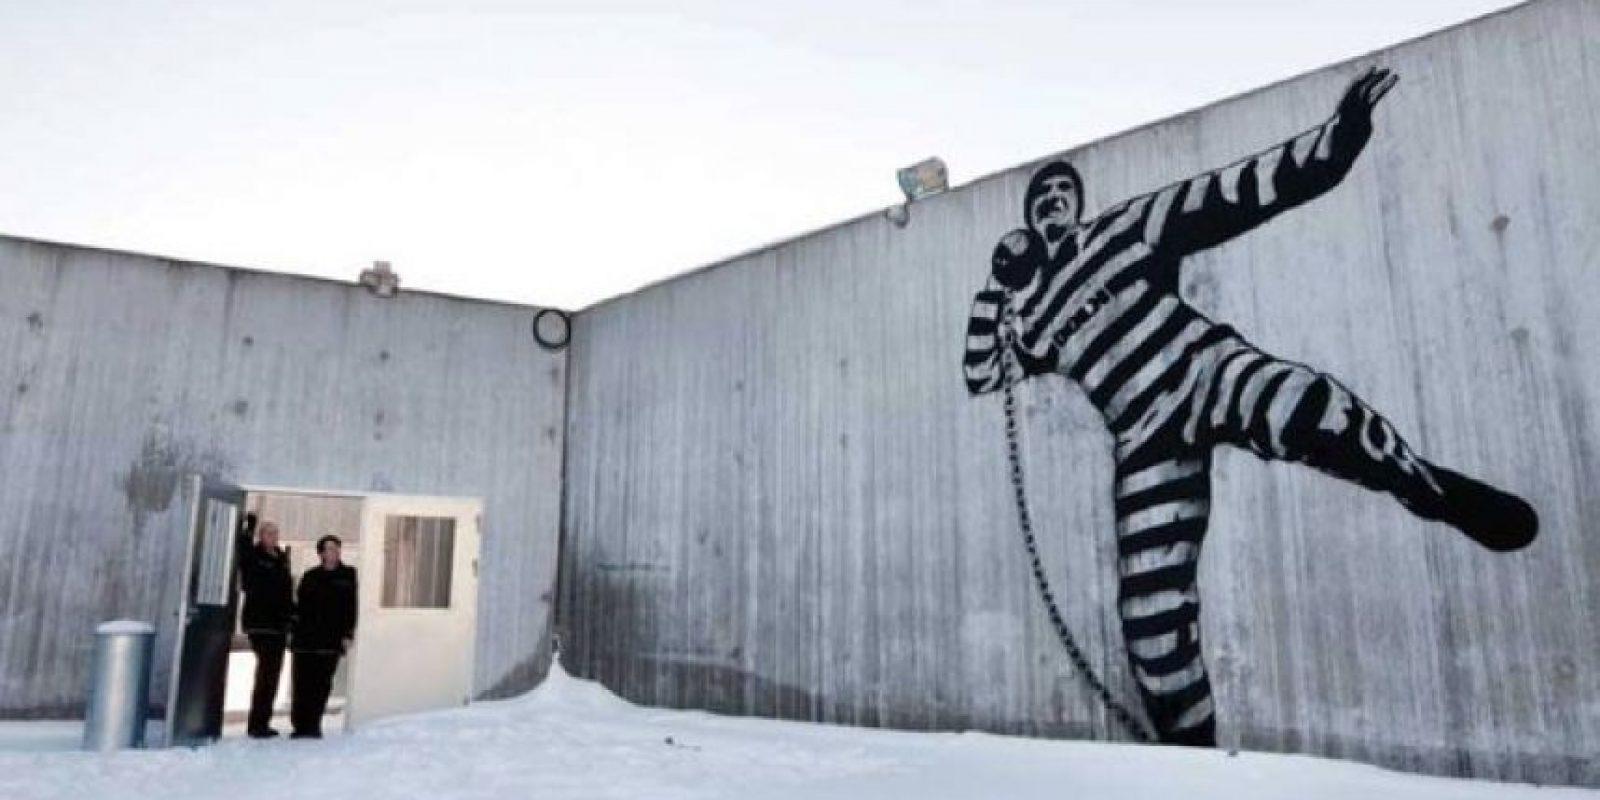 3- Halden Prison, en Halden, Noruega. Foto:Twitter.com